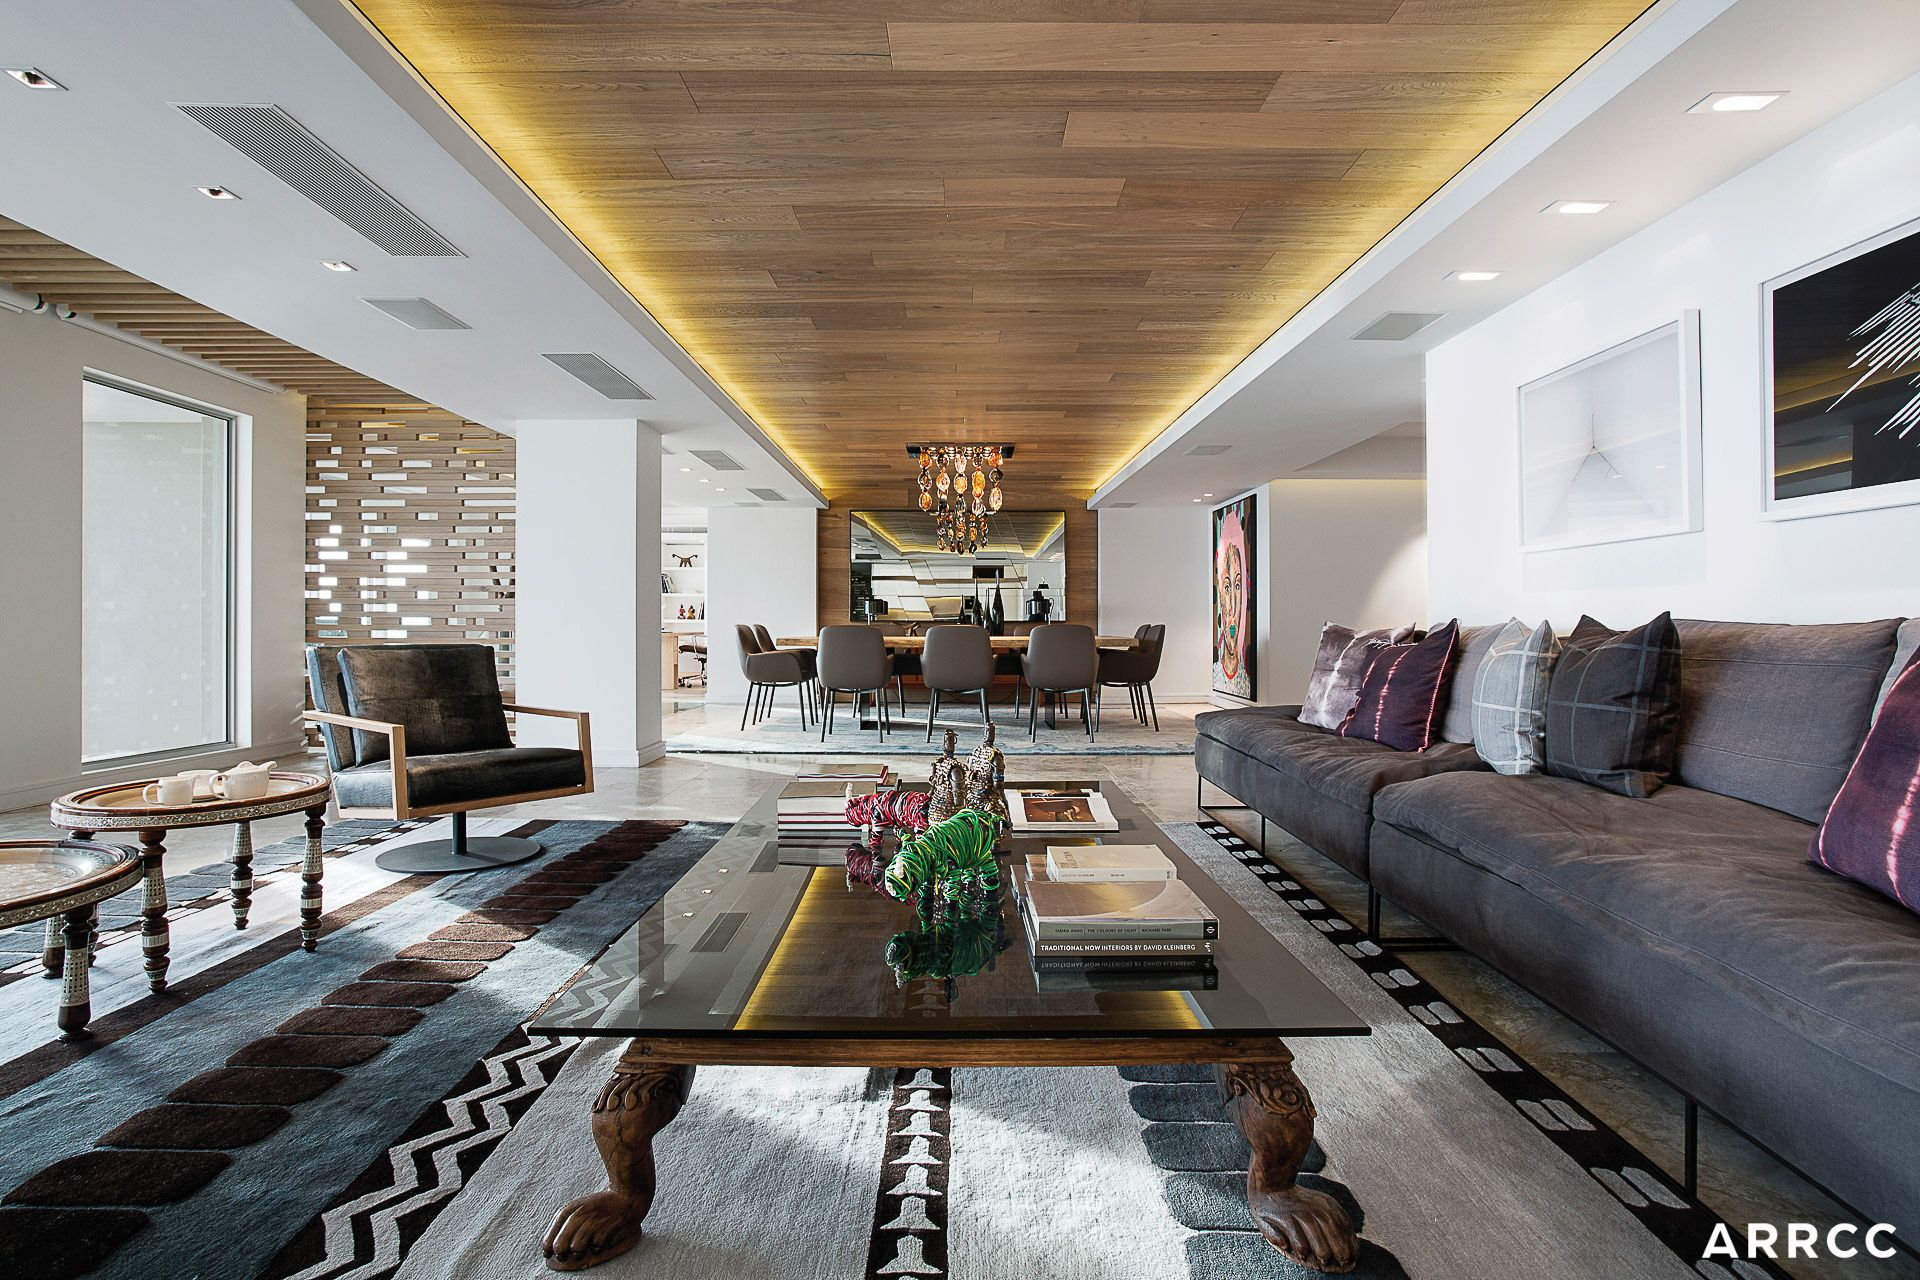 Za atlantic view arrcc inspiration design inspiration interior decor interior architecture house ideas luxury living room